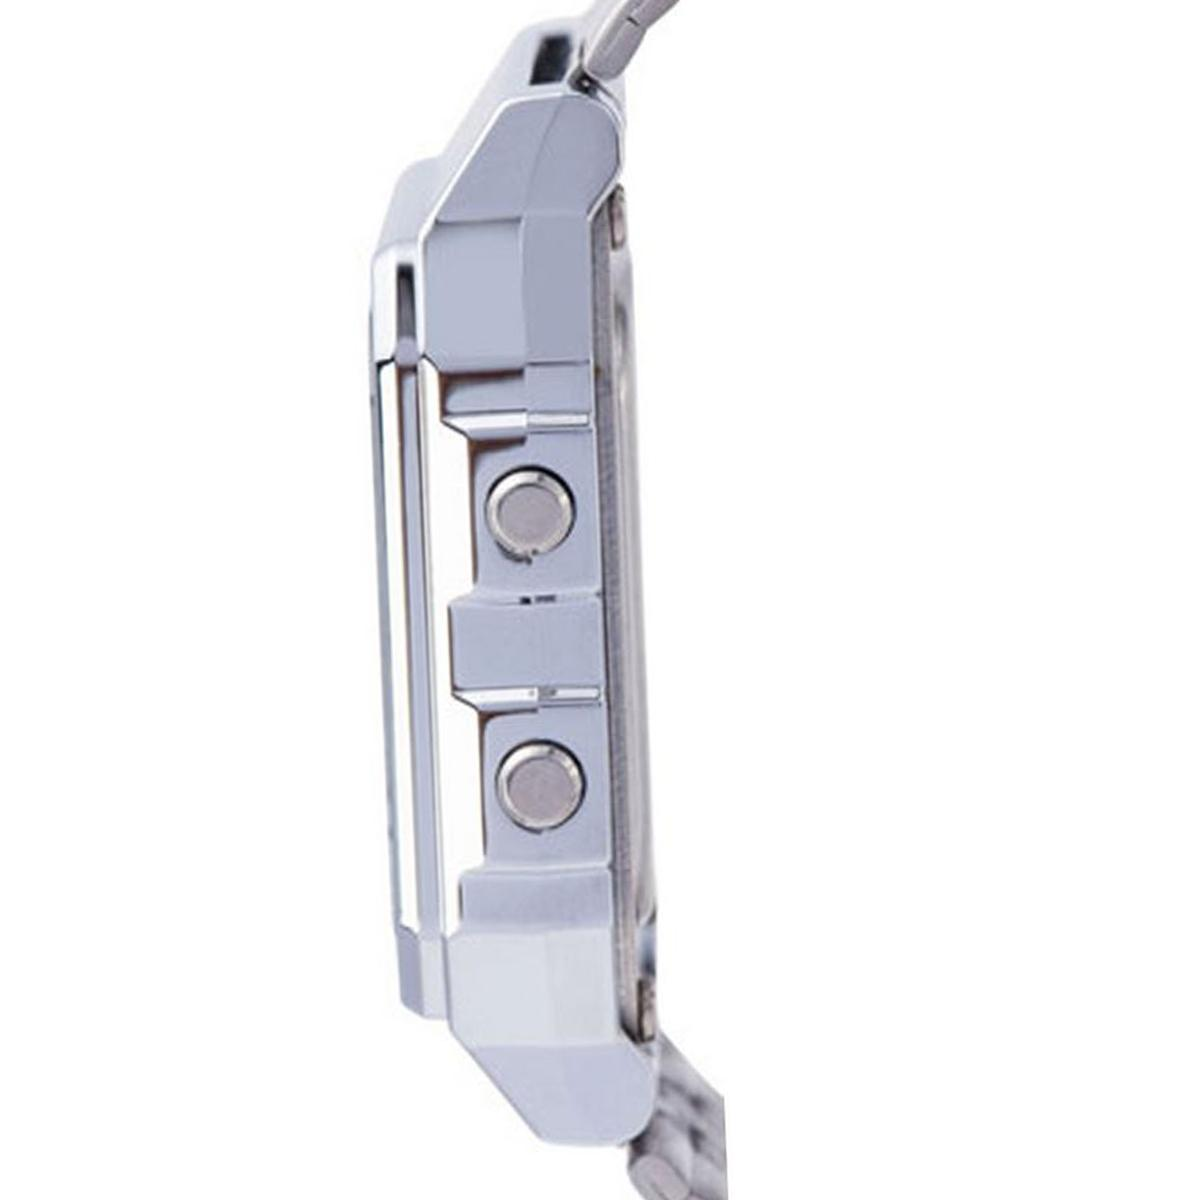 01dd4f3aa1e Relógio casio feminino vintage prata a500wa - Relógio Feminino ...